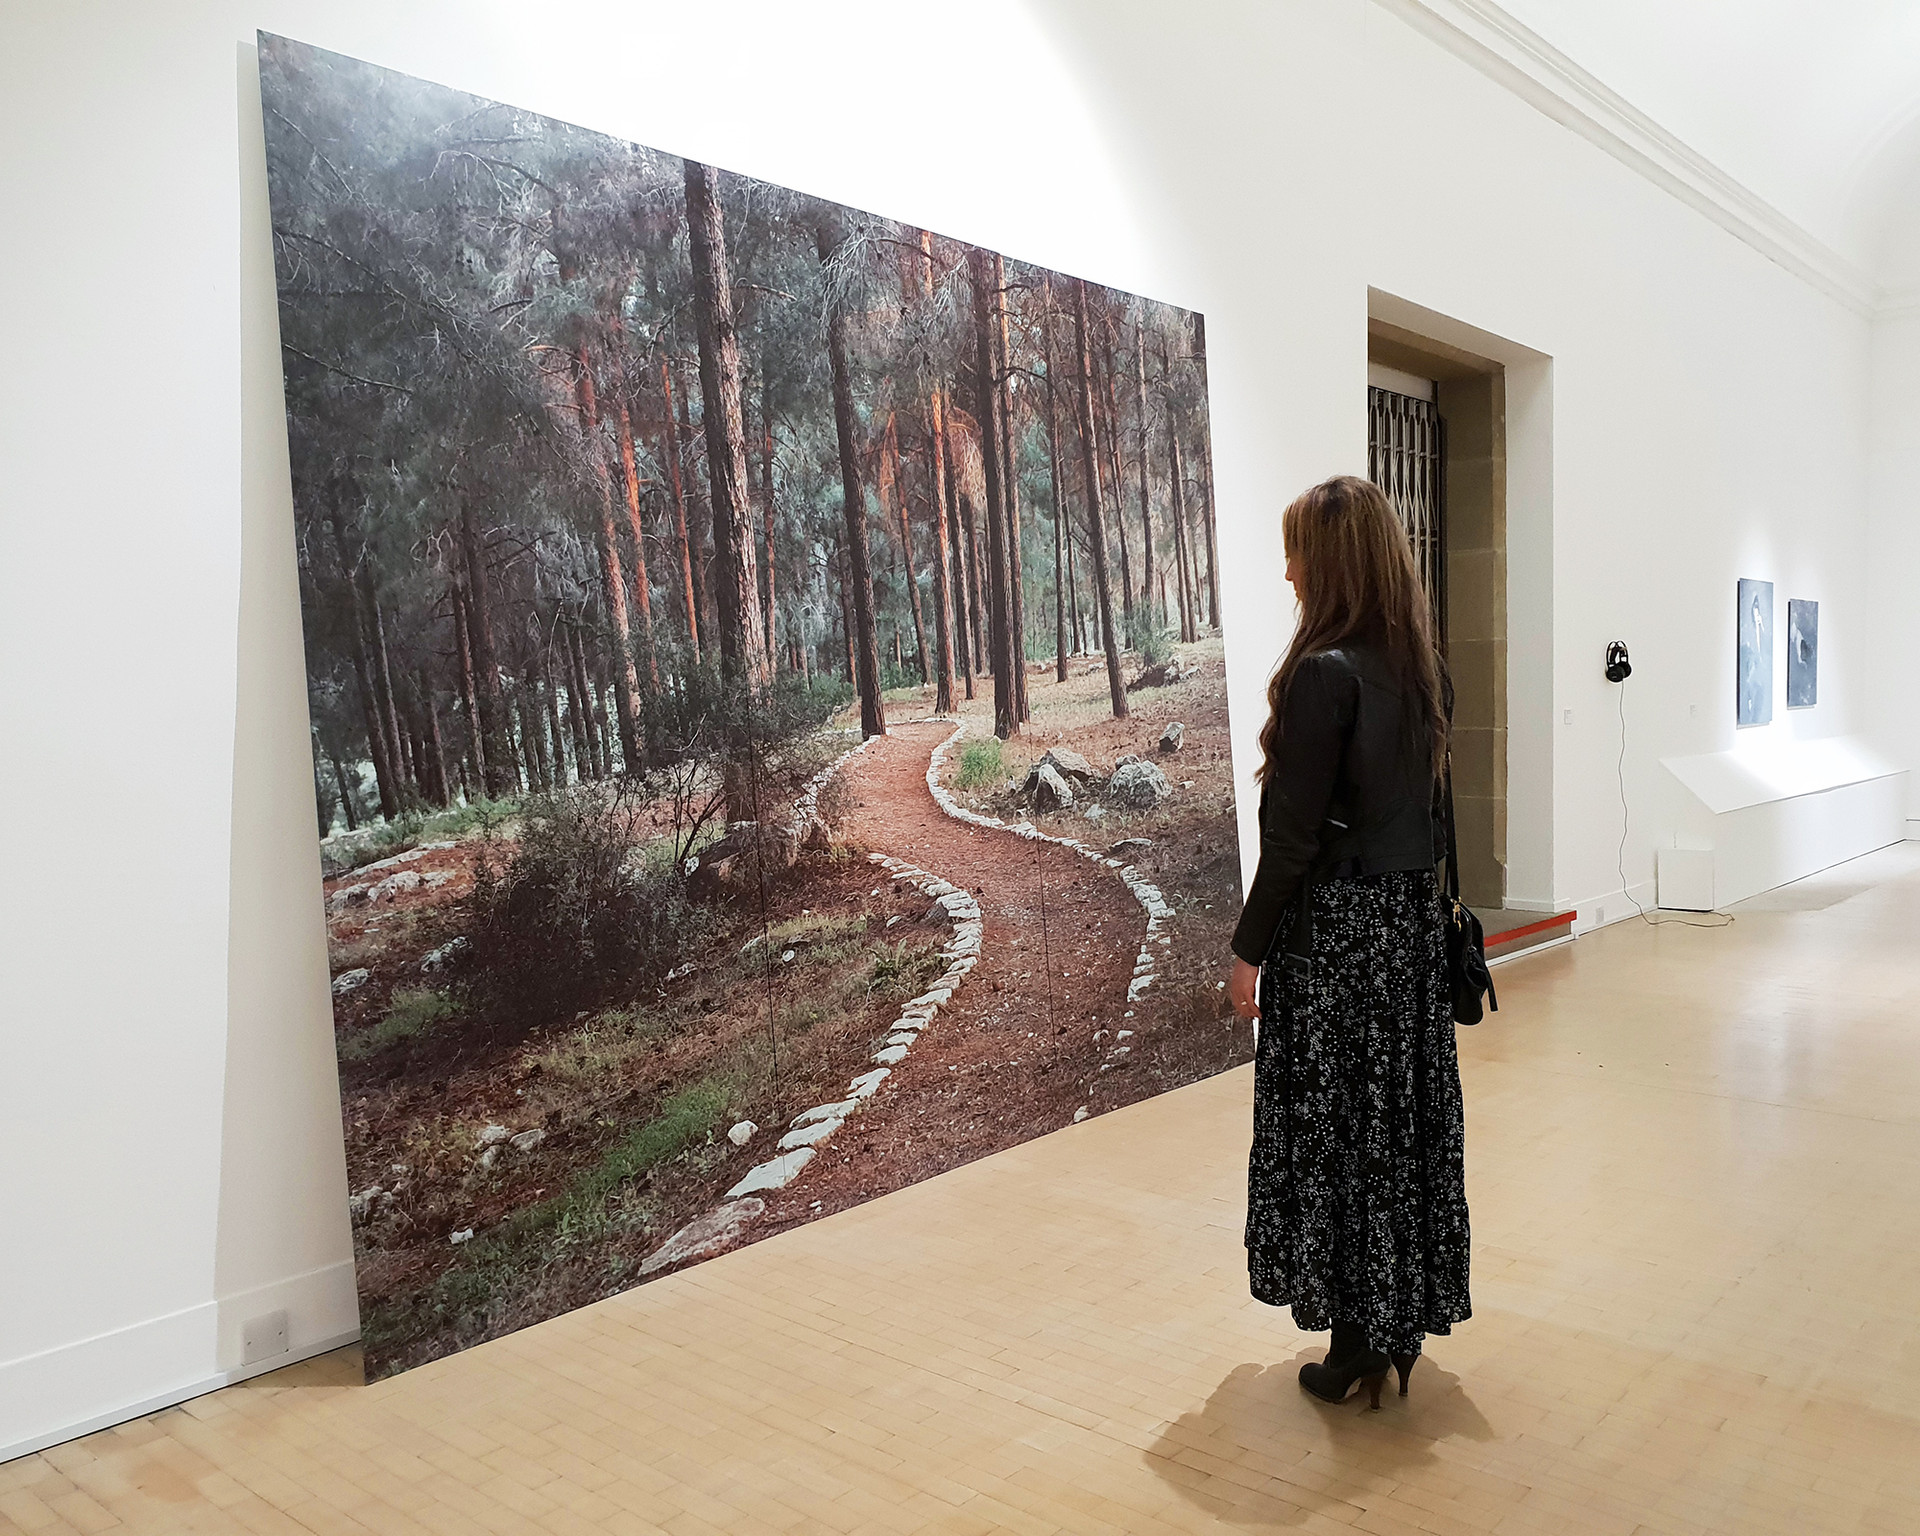 Stone Carved Trail, (installation), 2018, 264x330cm